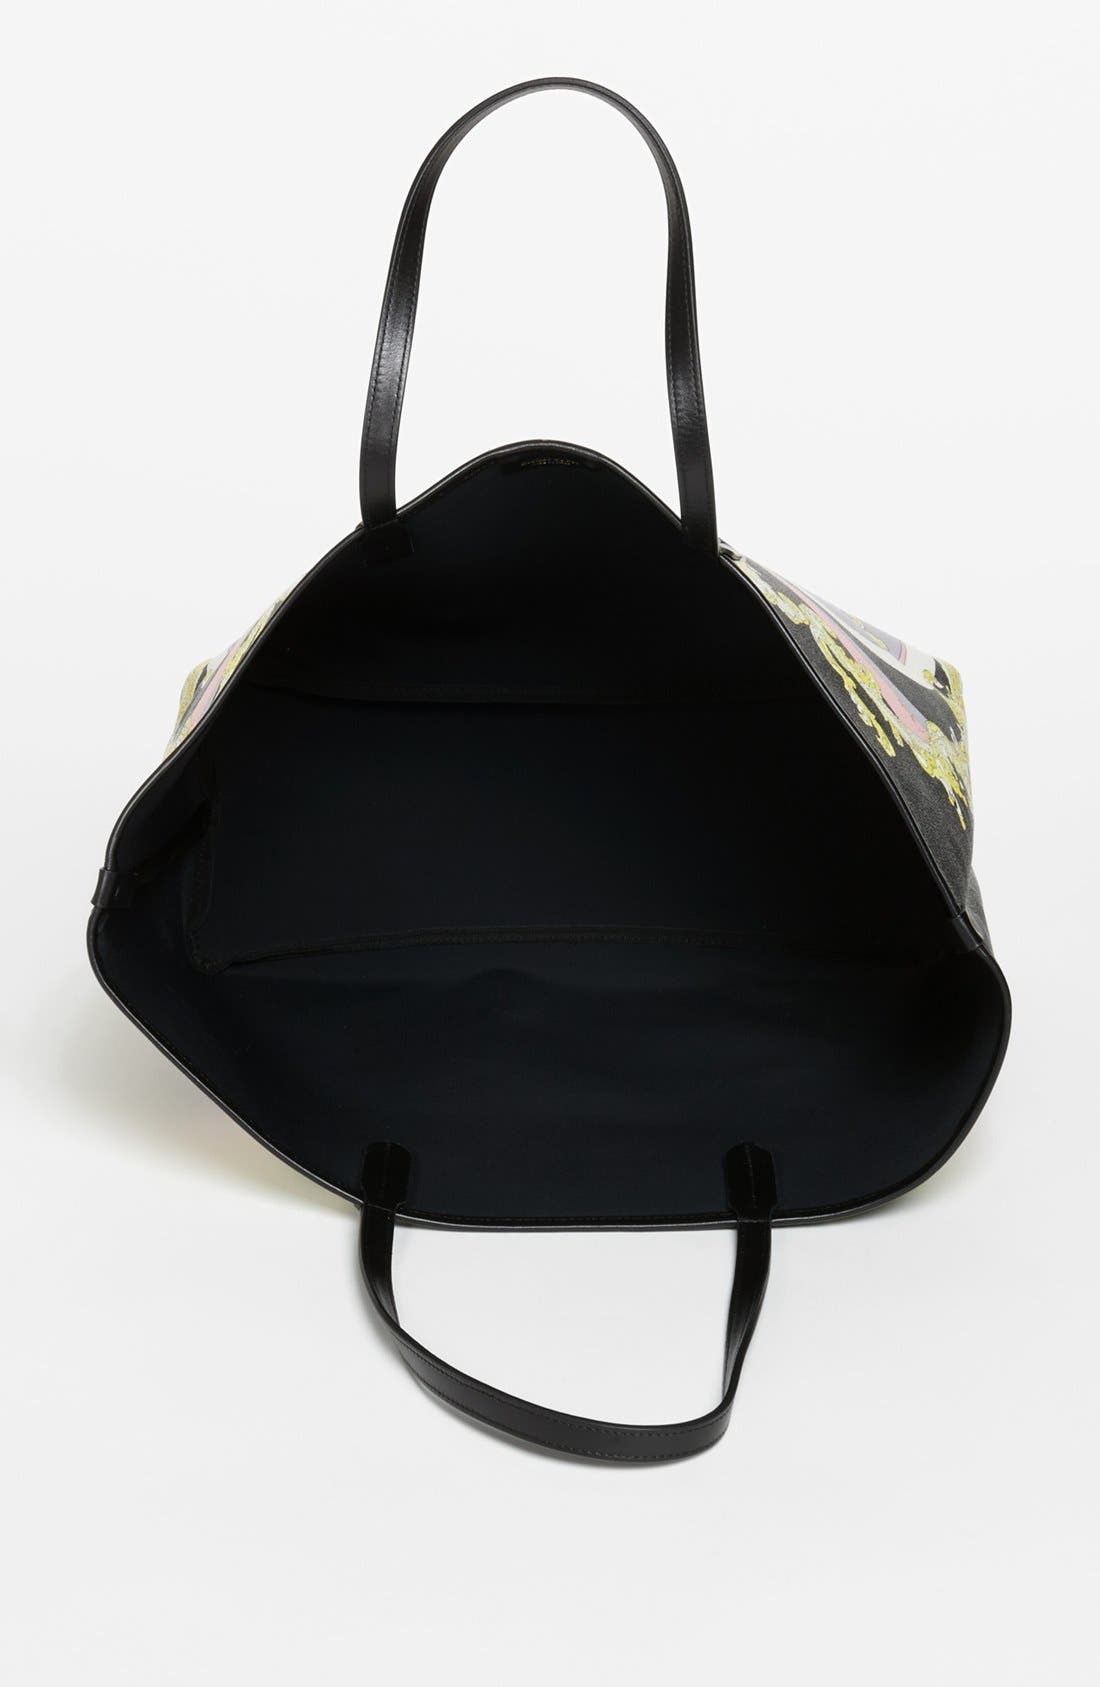 Alternate Image 3  - Emilio Pucci 'Large' Shopping Tote